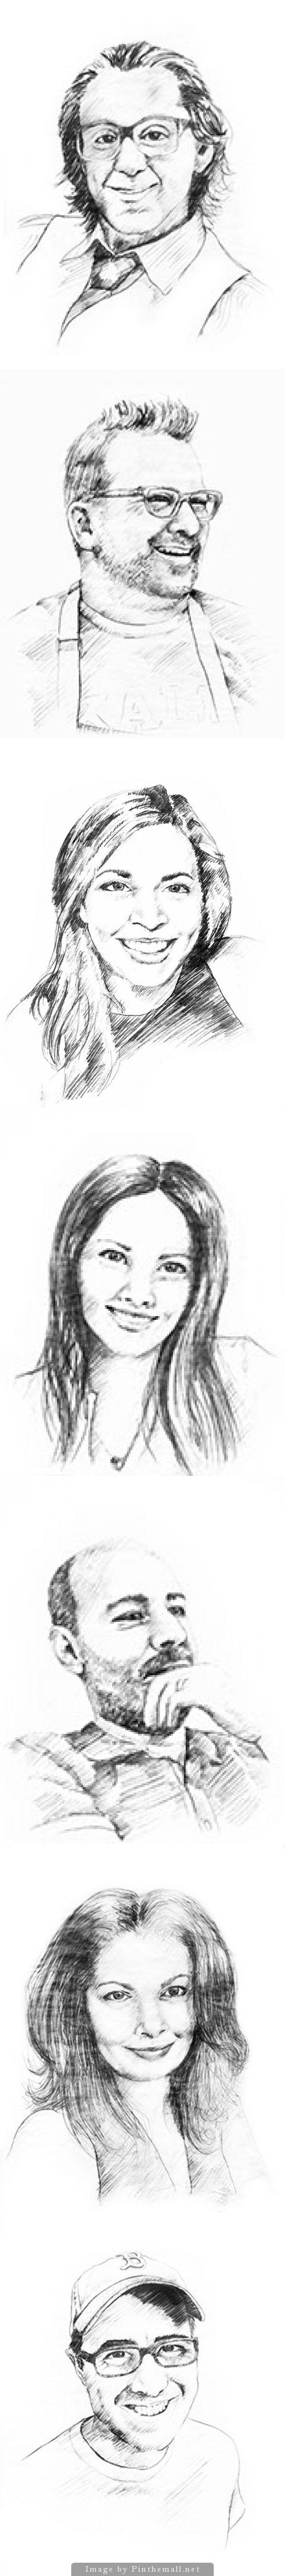 Pencil sketched portrait illustrations for restaurant website | Amelia Street Studio